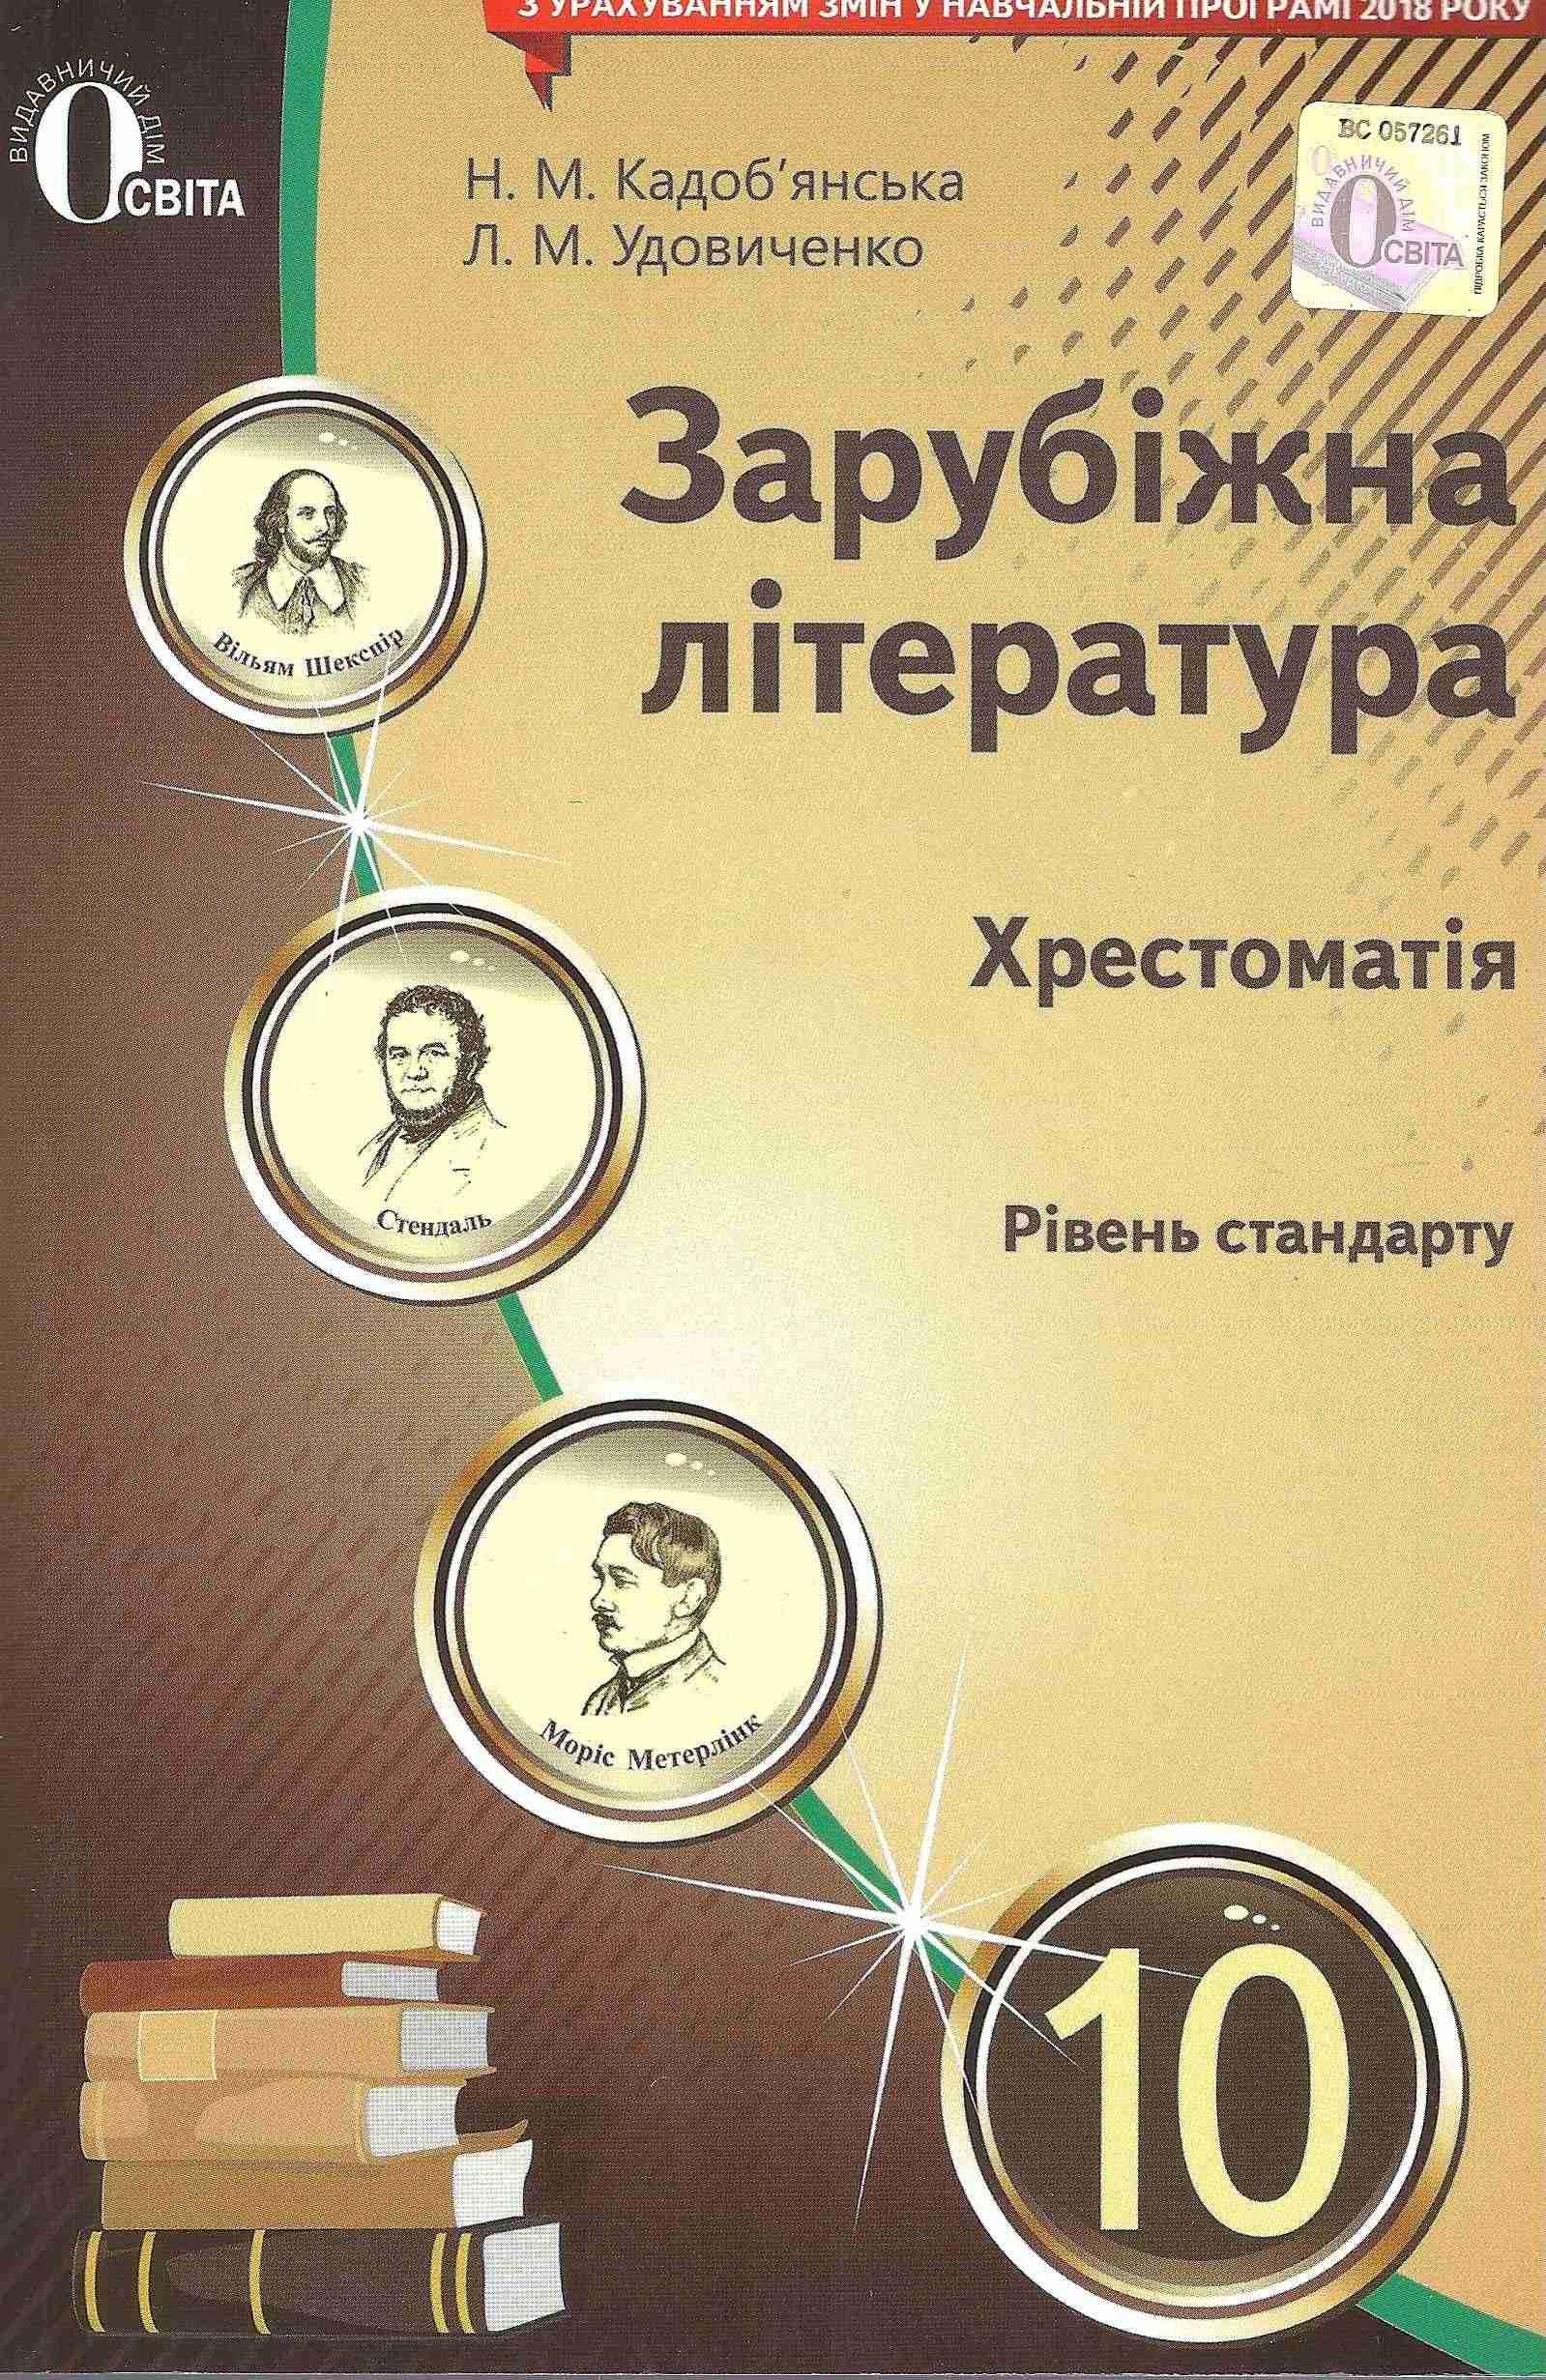 Зарубіжна література 10 клас Рівень стандарту Хрестоматія Кадоб'янська Н. Освіта